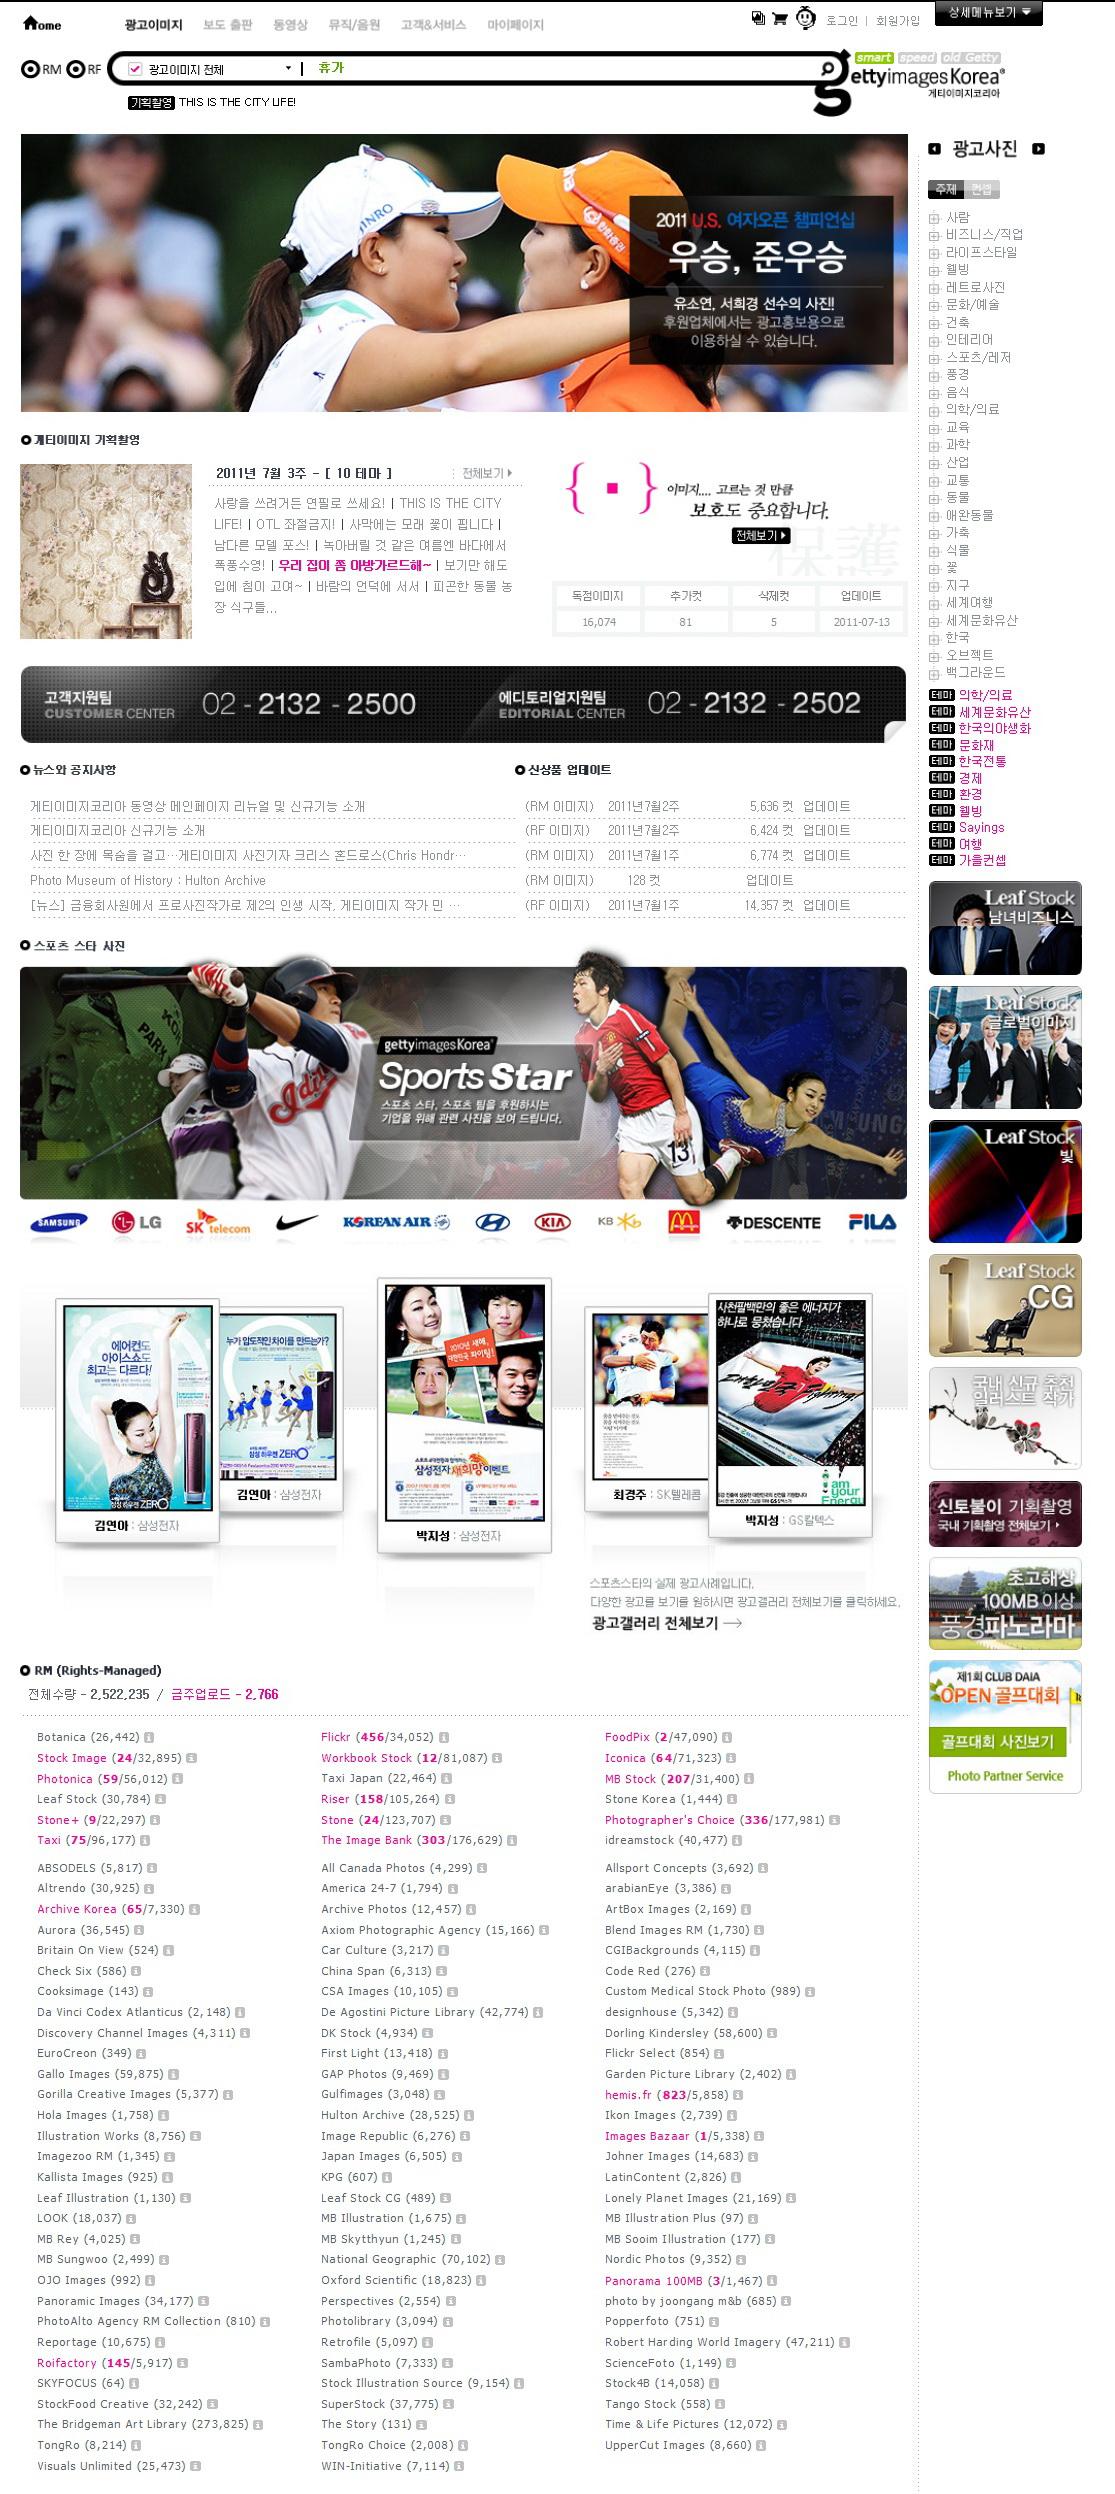 gettyimageskorea_com_20110722_153719.jpg